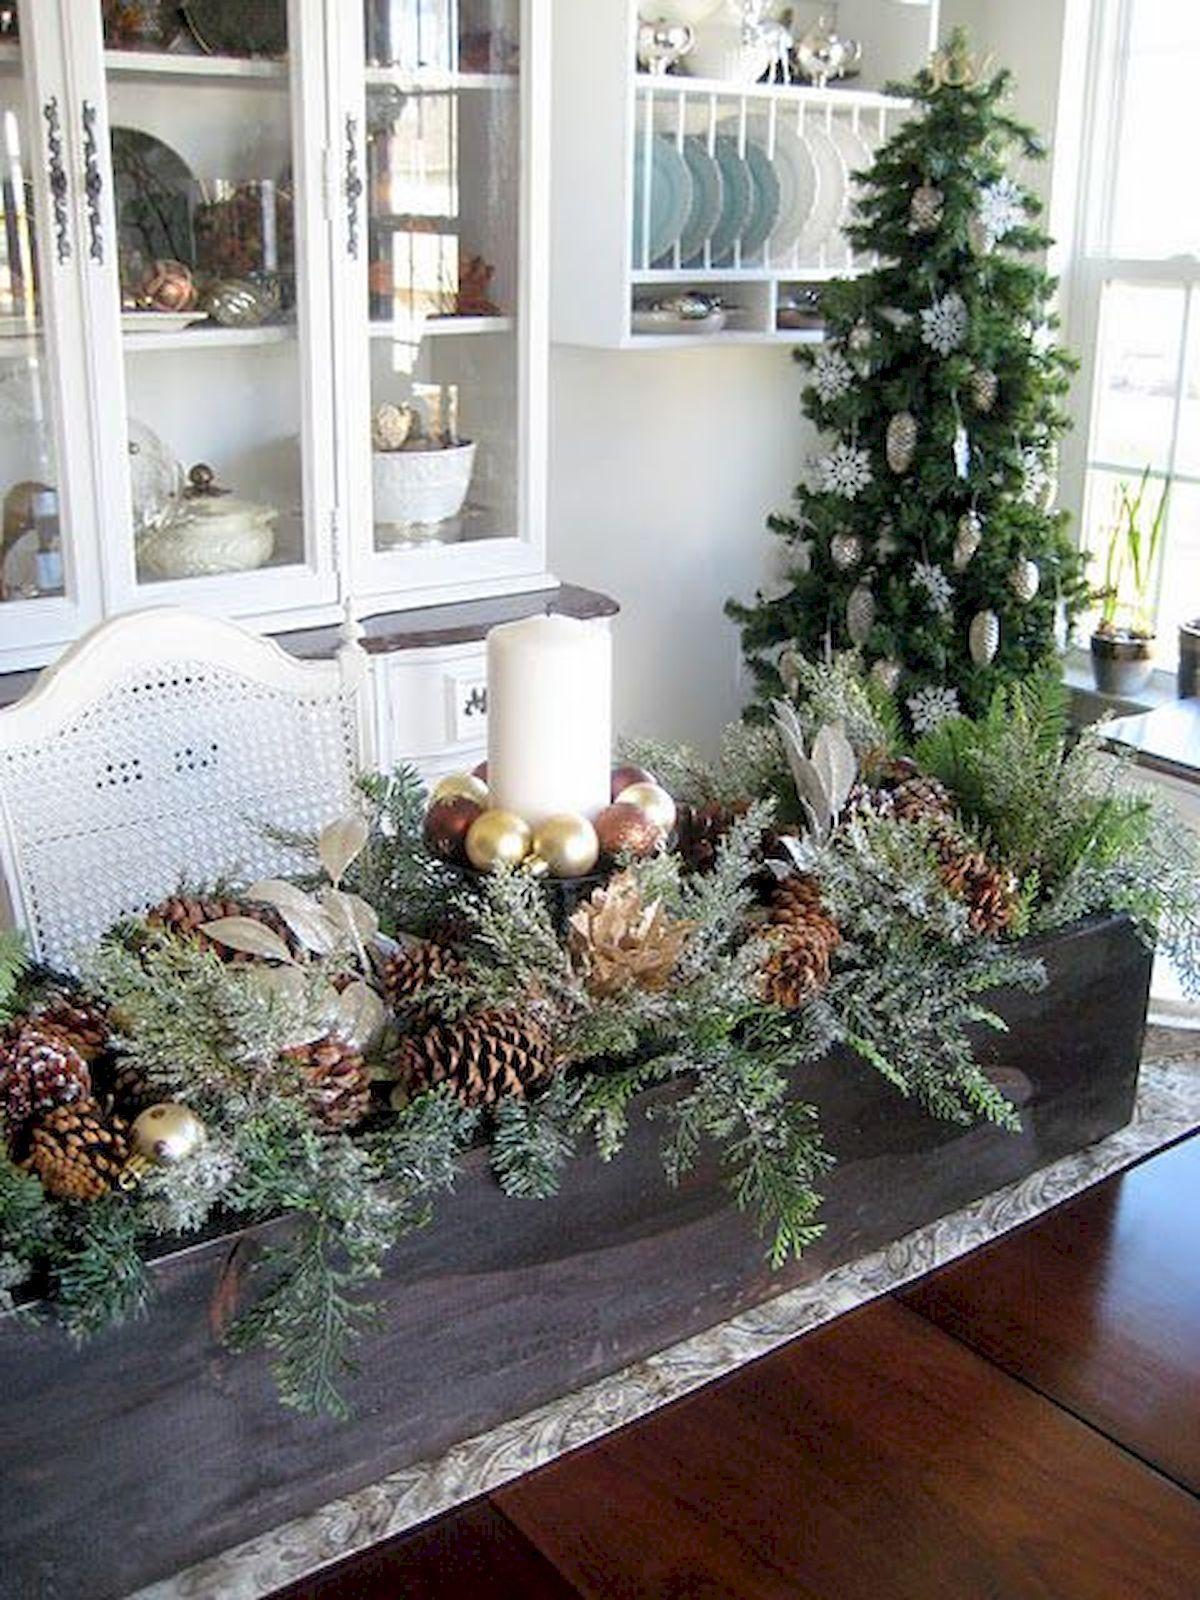 Adorable 35 Beautiful Christmas Decor Ideas Table Centerpiece Httpscoachdecorcom